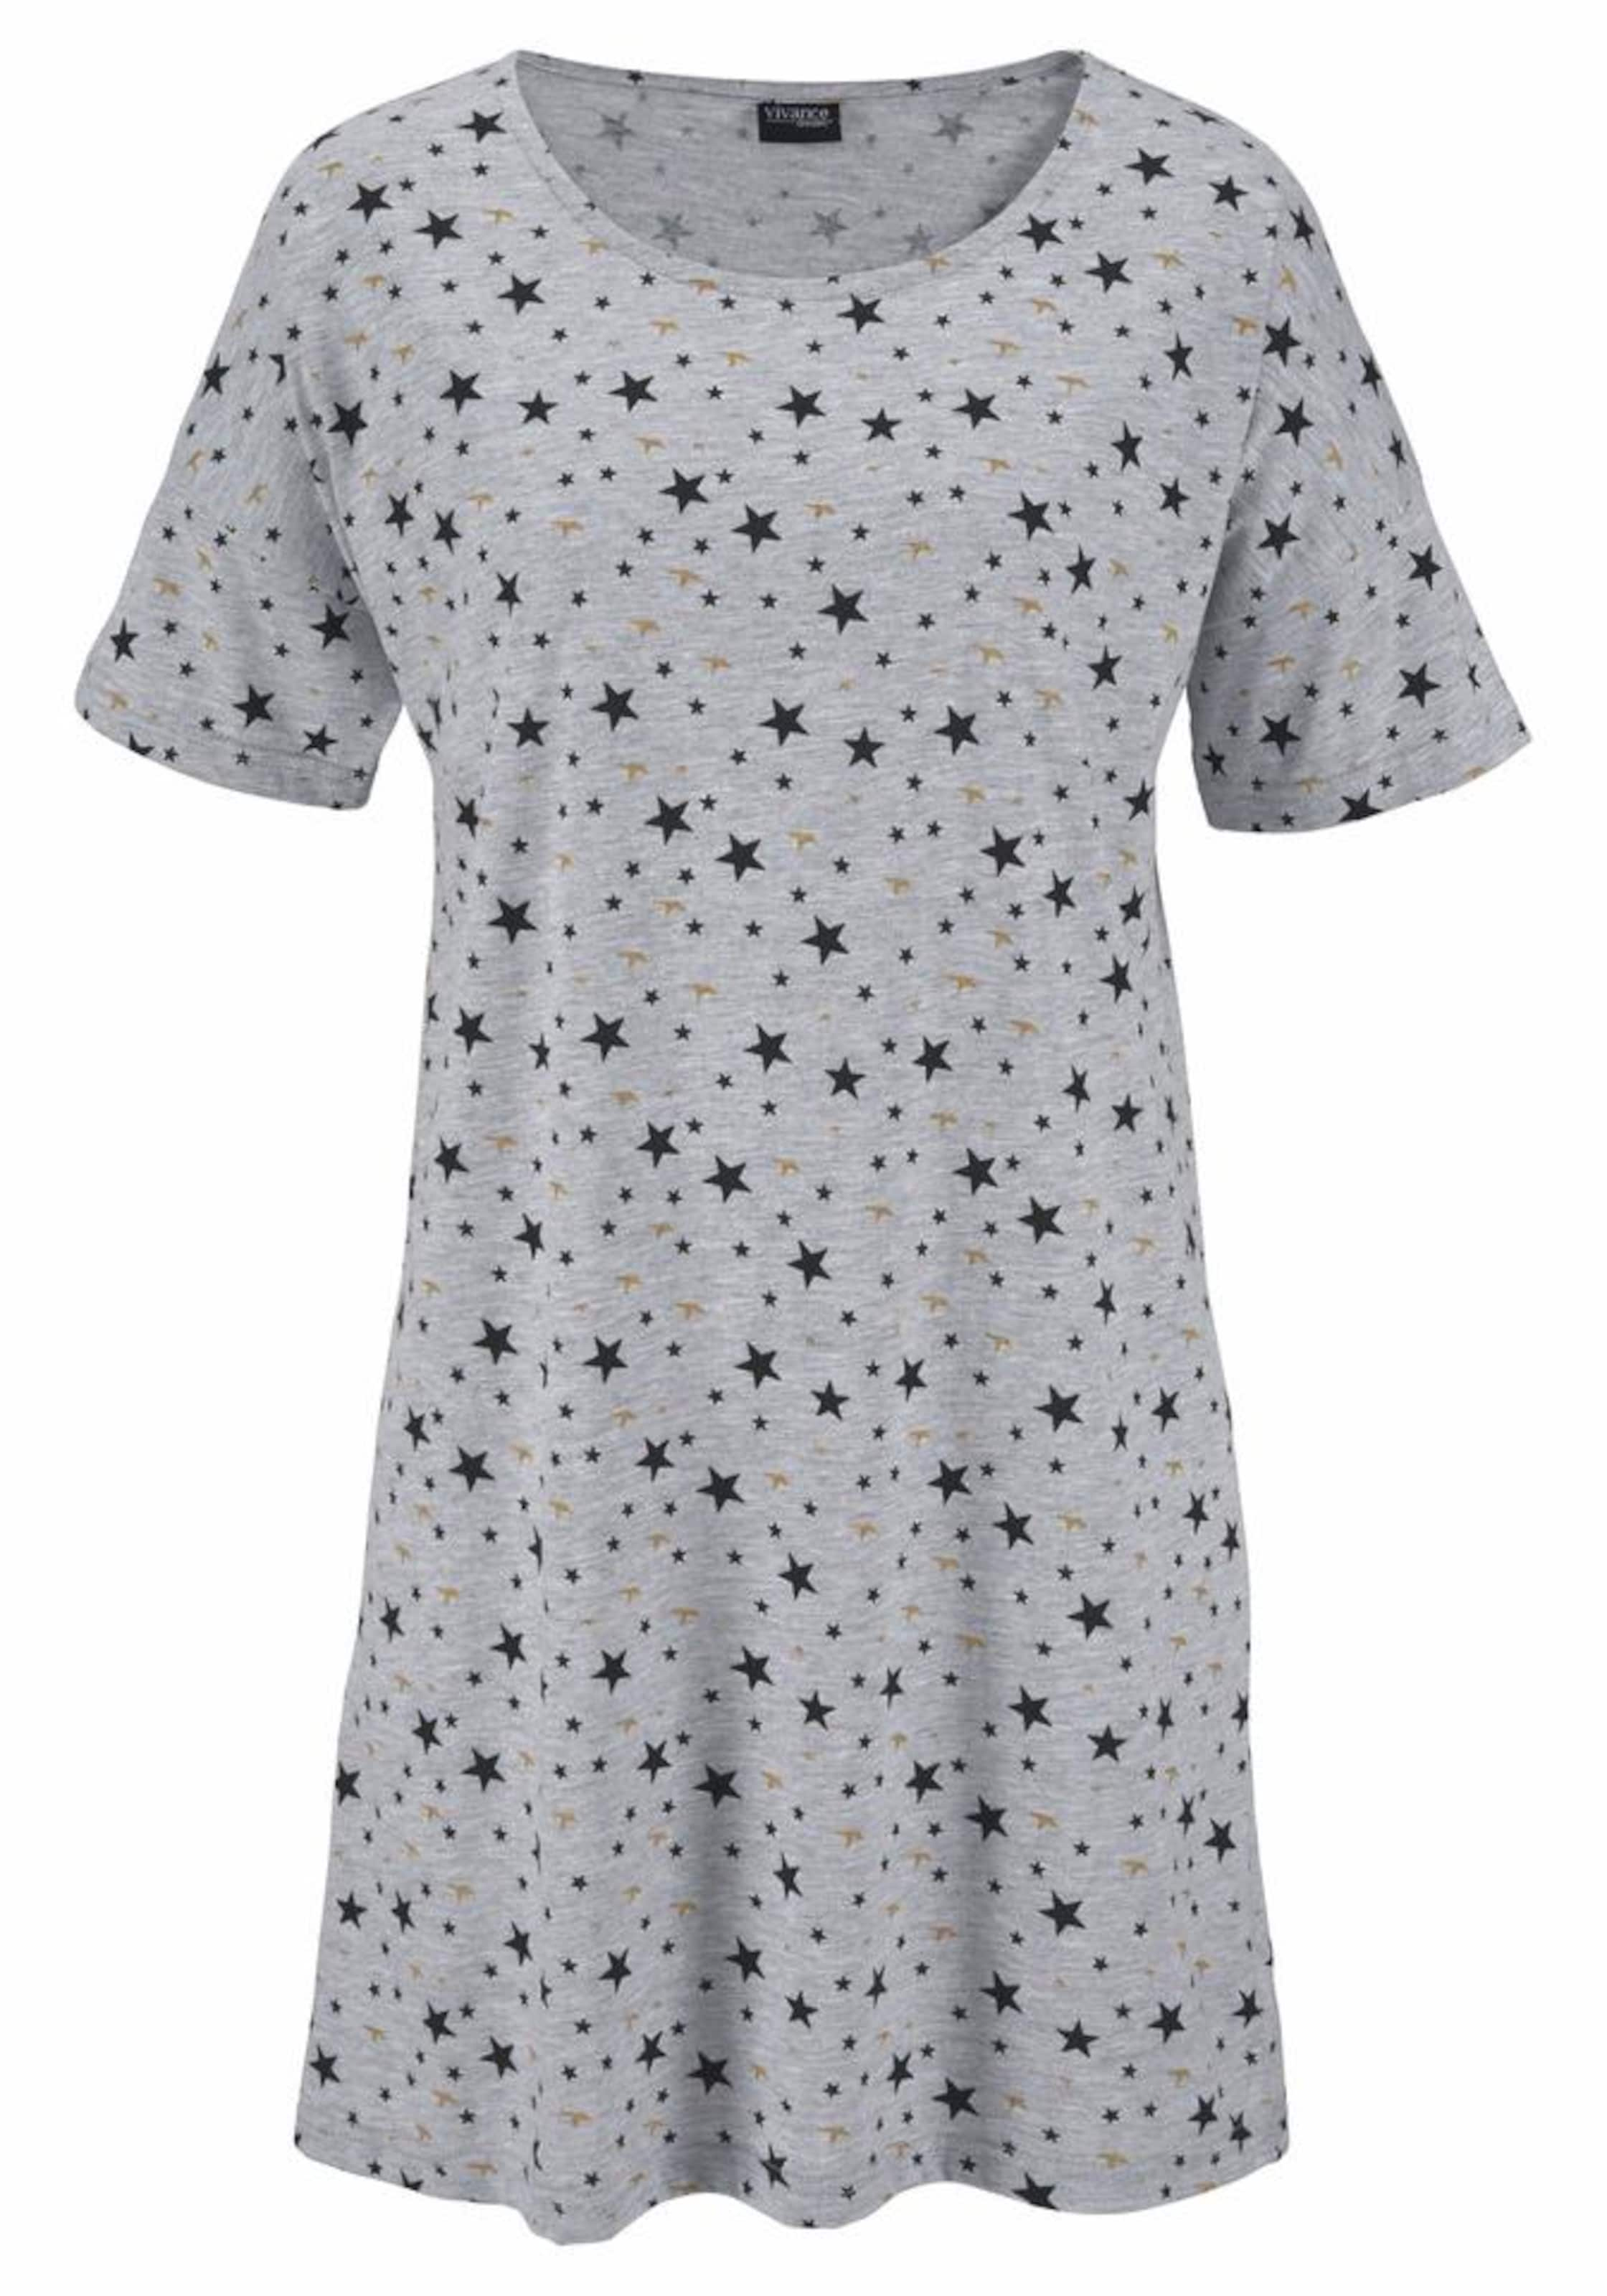 VIVANCE Dreams Nachthemd kurz (2 Stück) Preis Neu Zu Verkaufen UHdSW7D